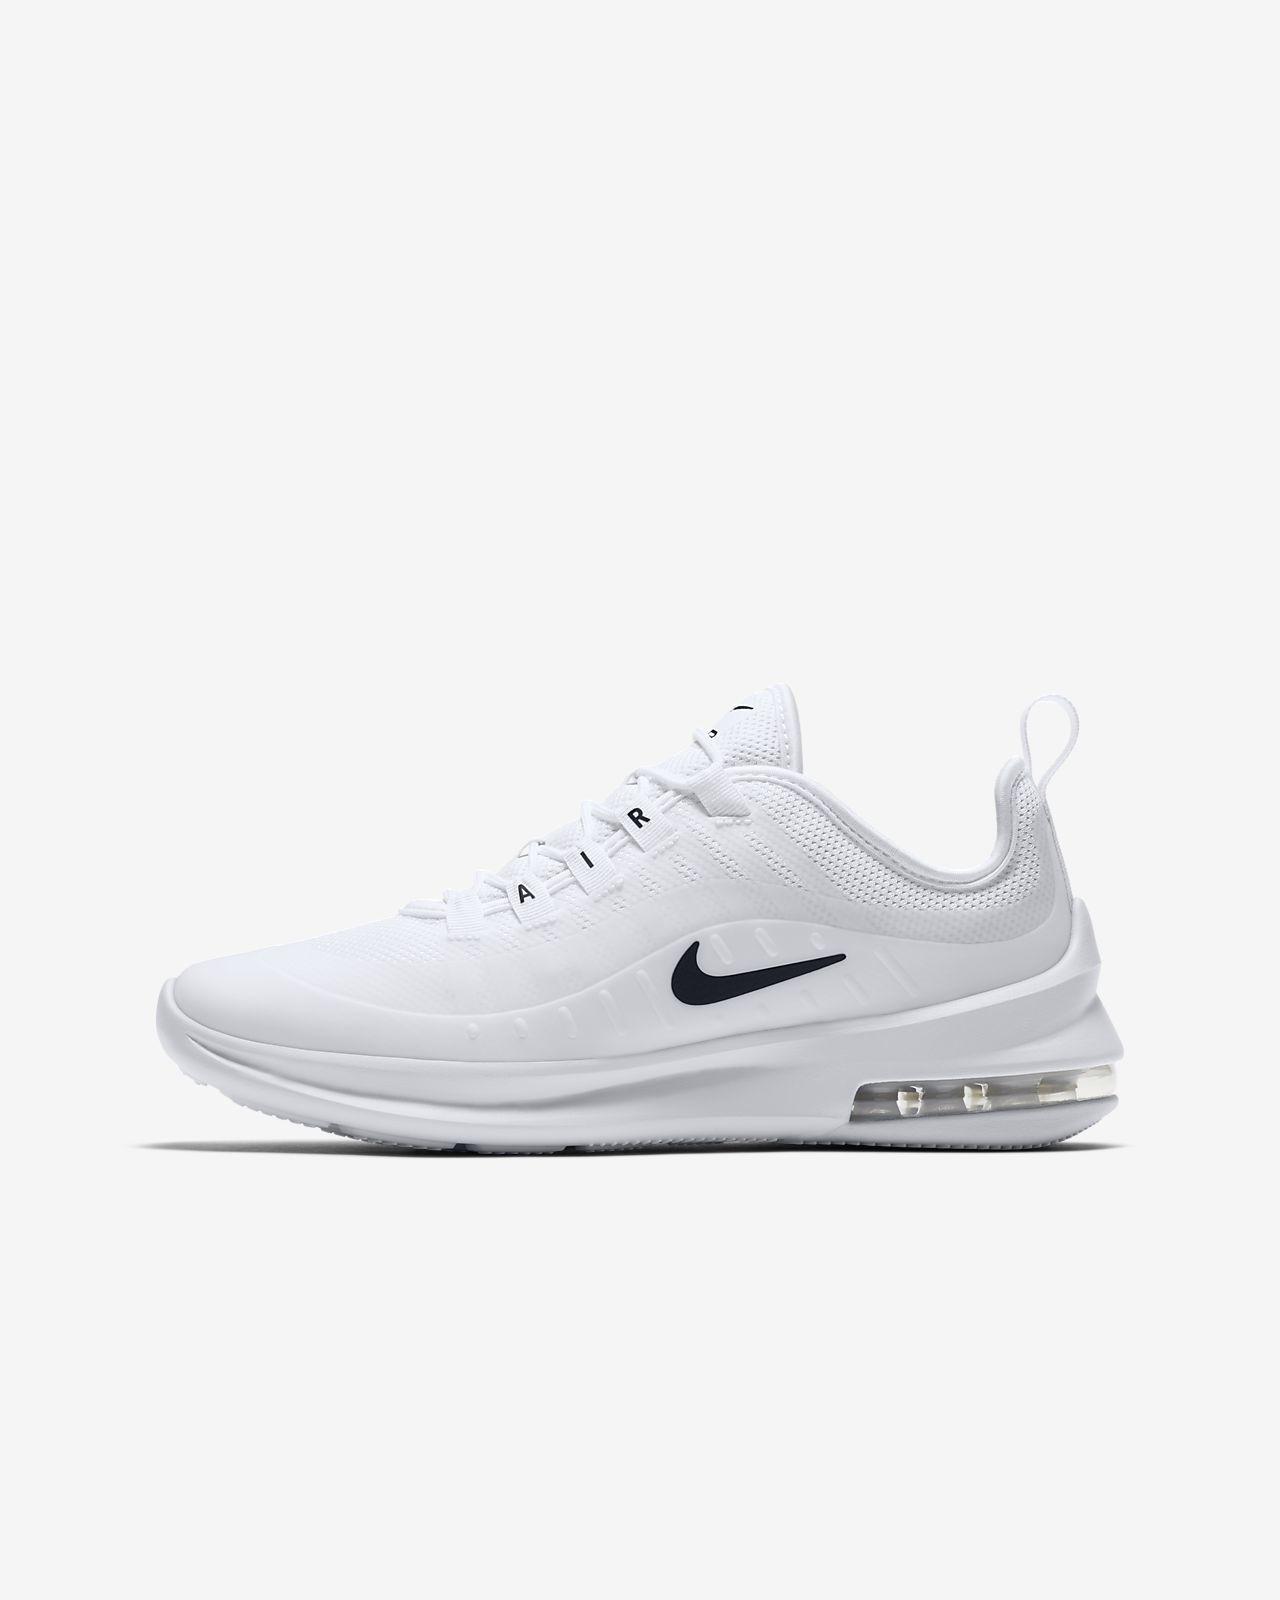 Nike Air Max Axis Big Kids' Shoe. Nike